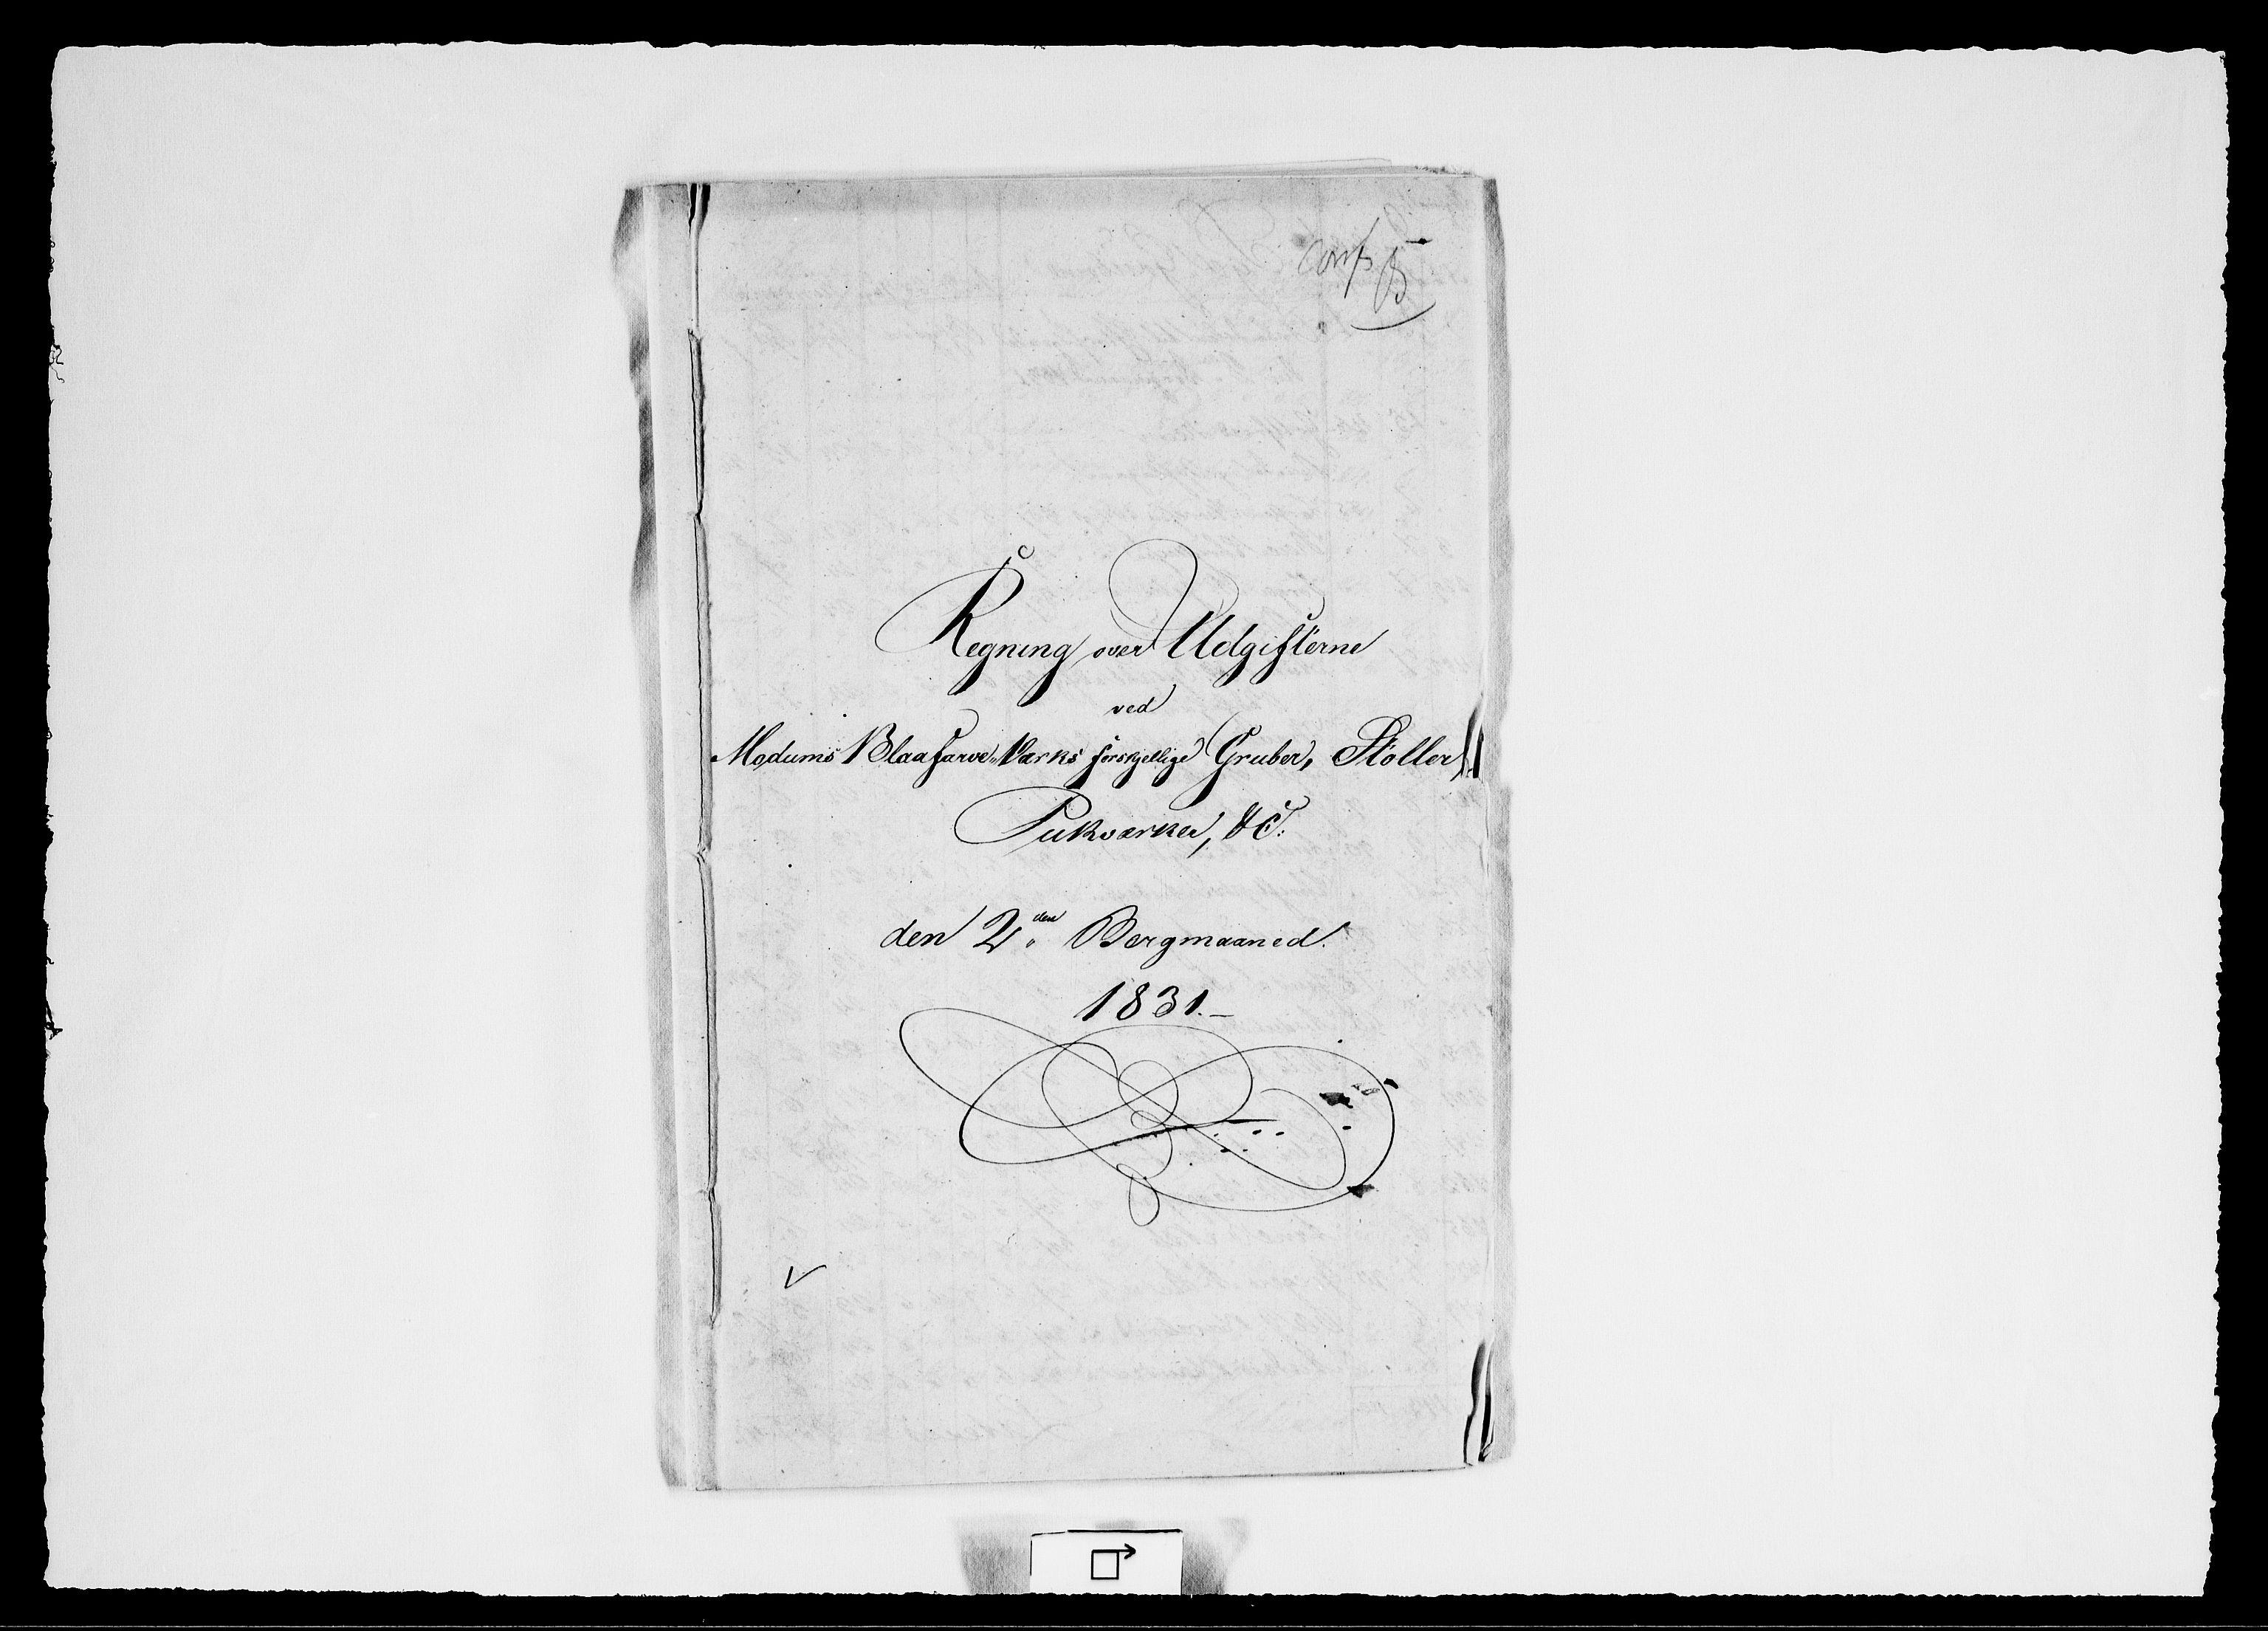 RA, Modums Blaafarveværk, G/Gd/Gdd/L0258, 1831, s. 2